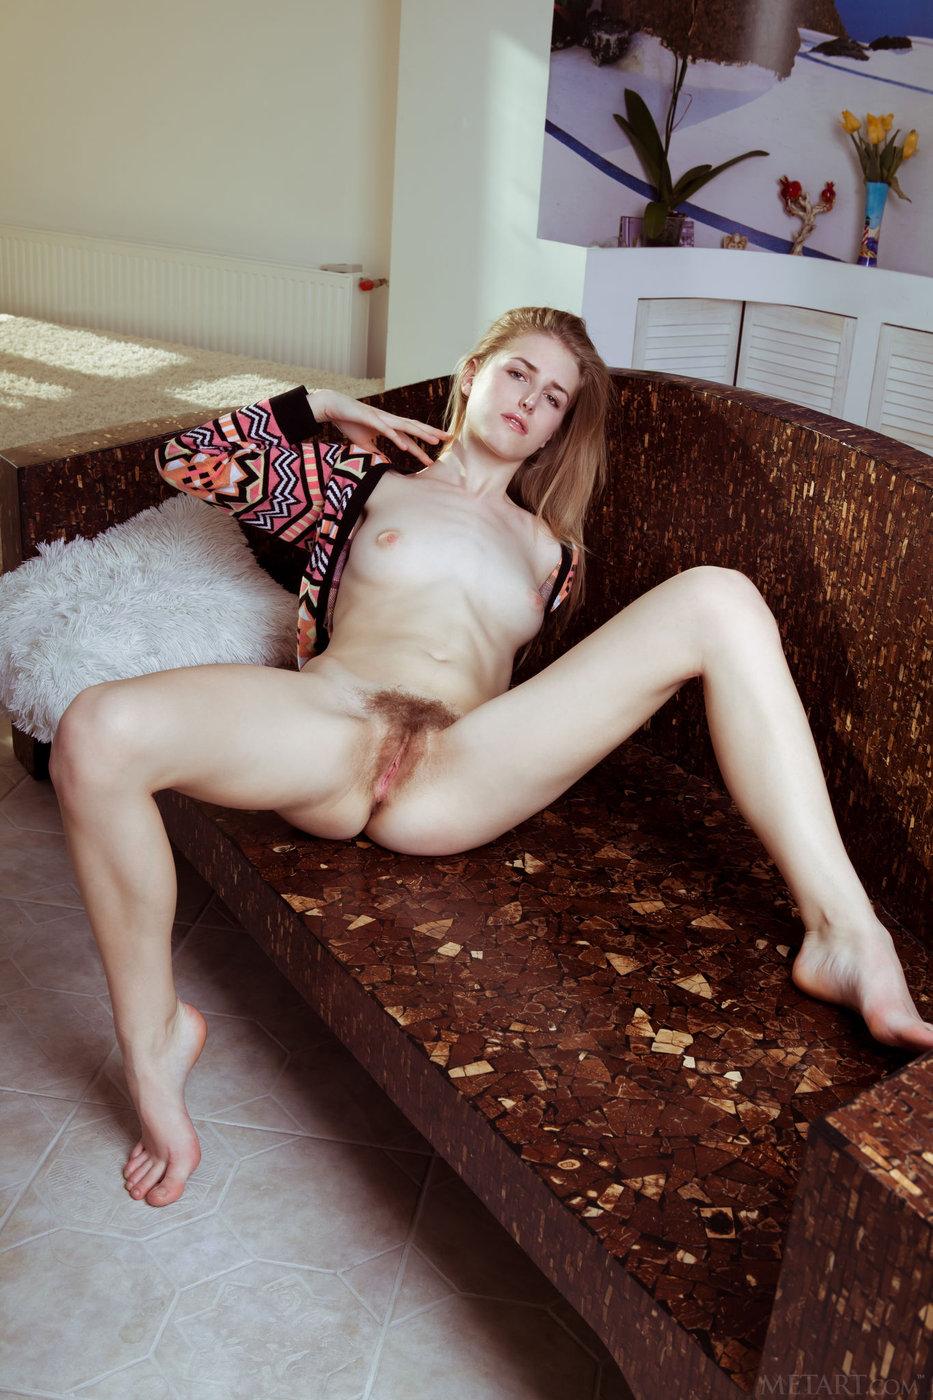 Blond pornstars with big boobs